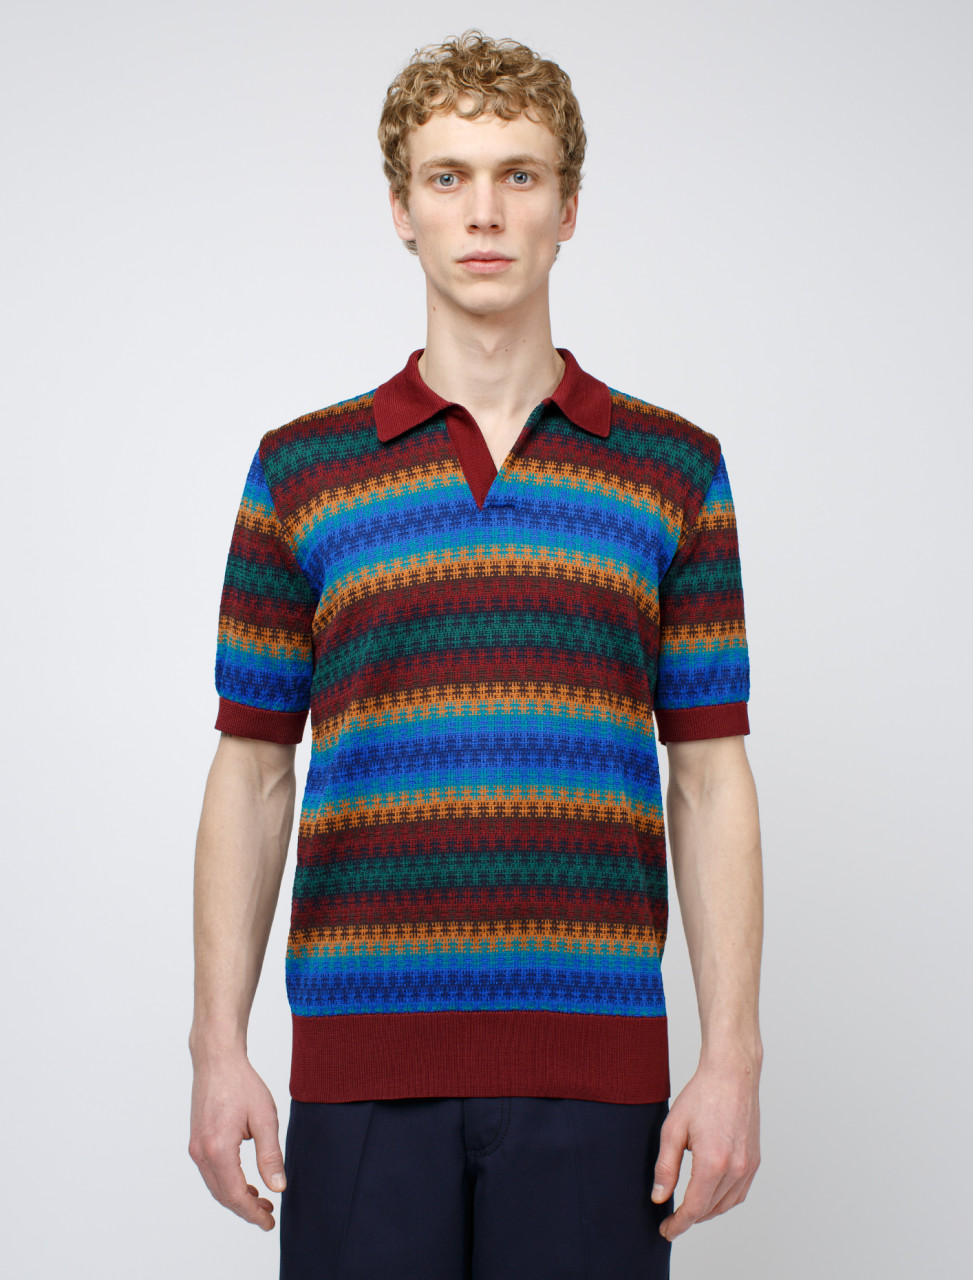 Network Sweater